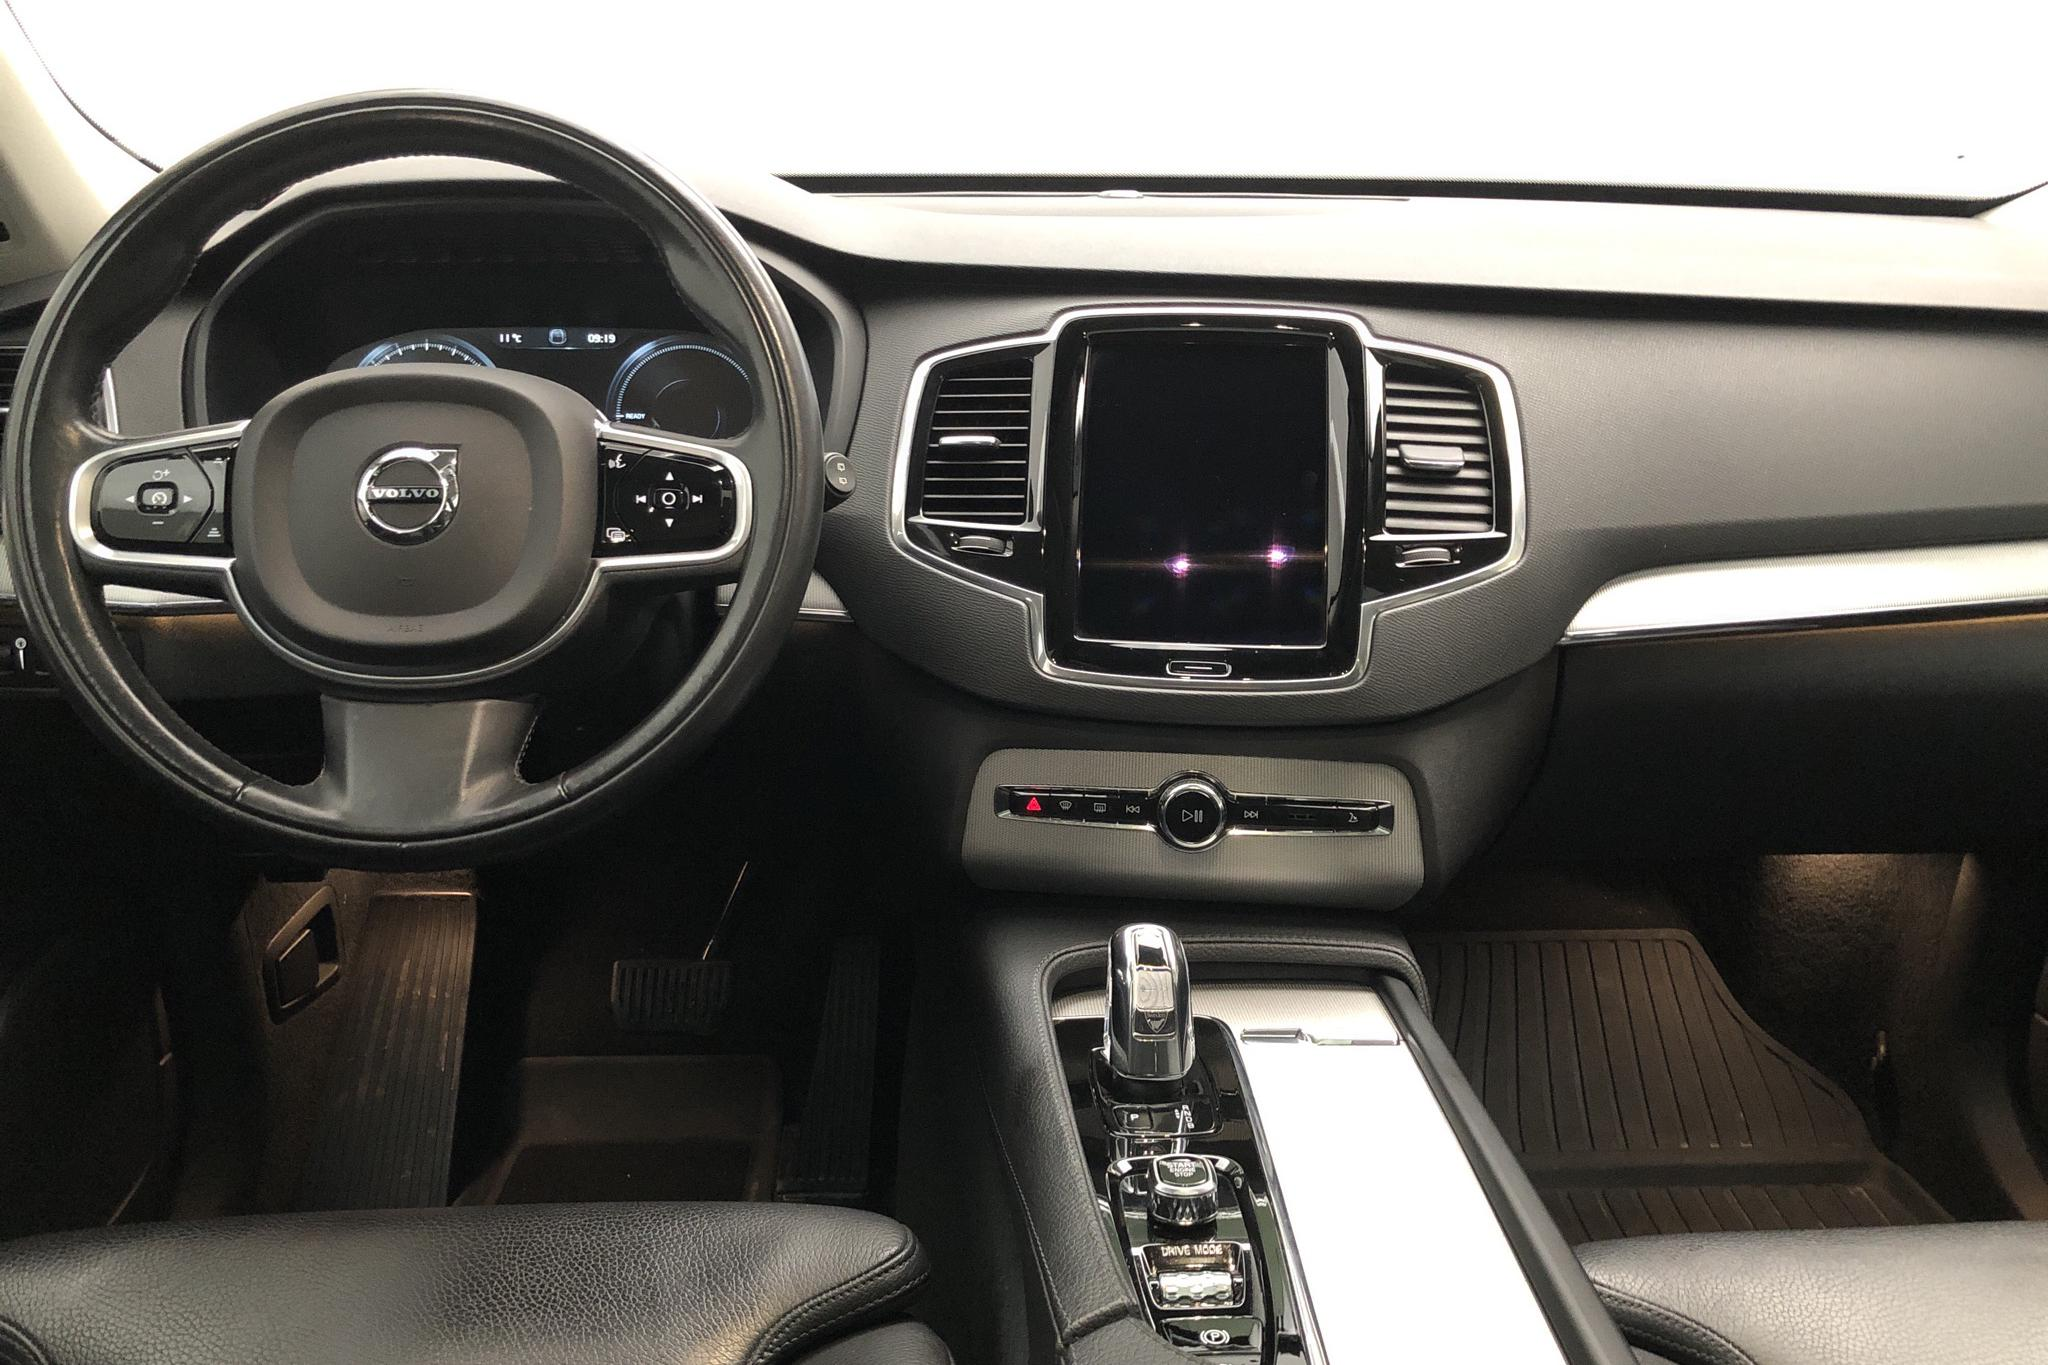 Volvo XC90 T8 AWD Twin Engine (400hk) - 71 720 km - Automatic - gray - 2018